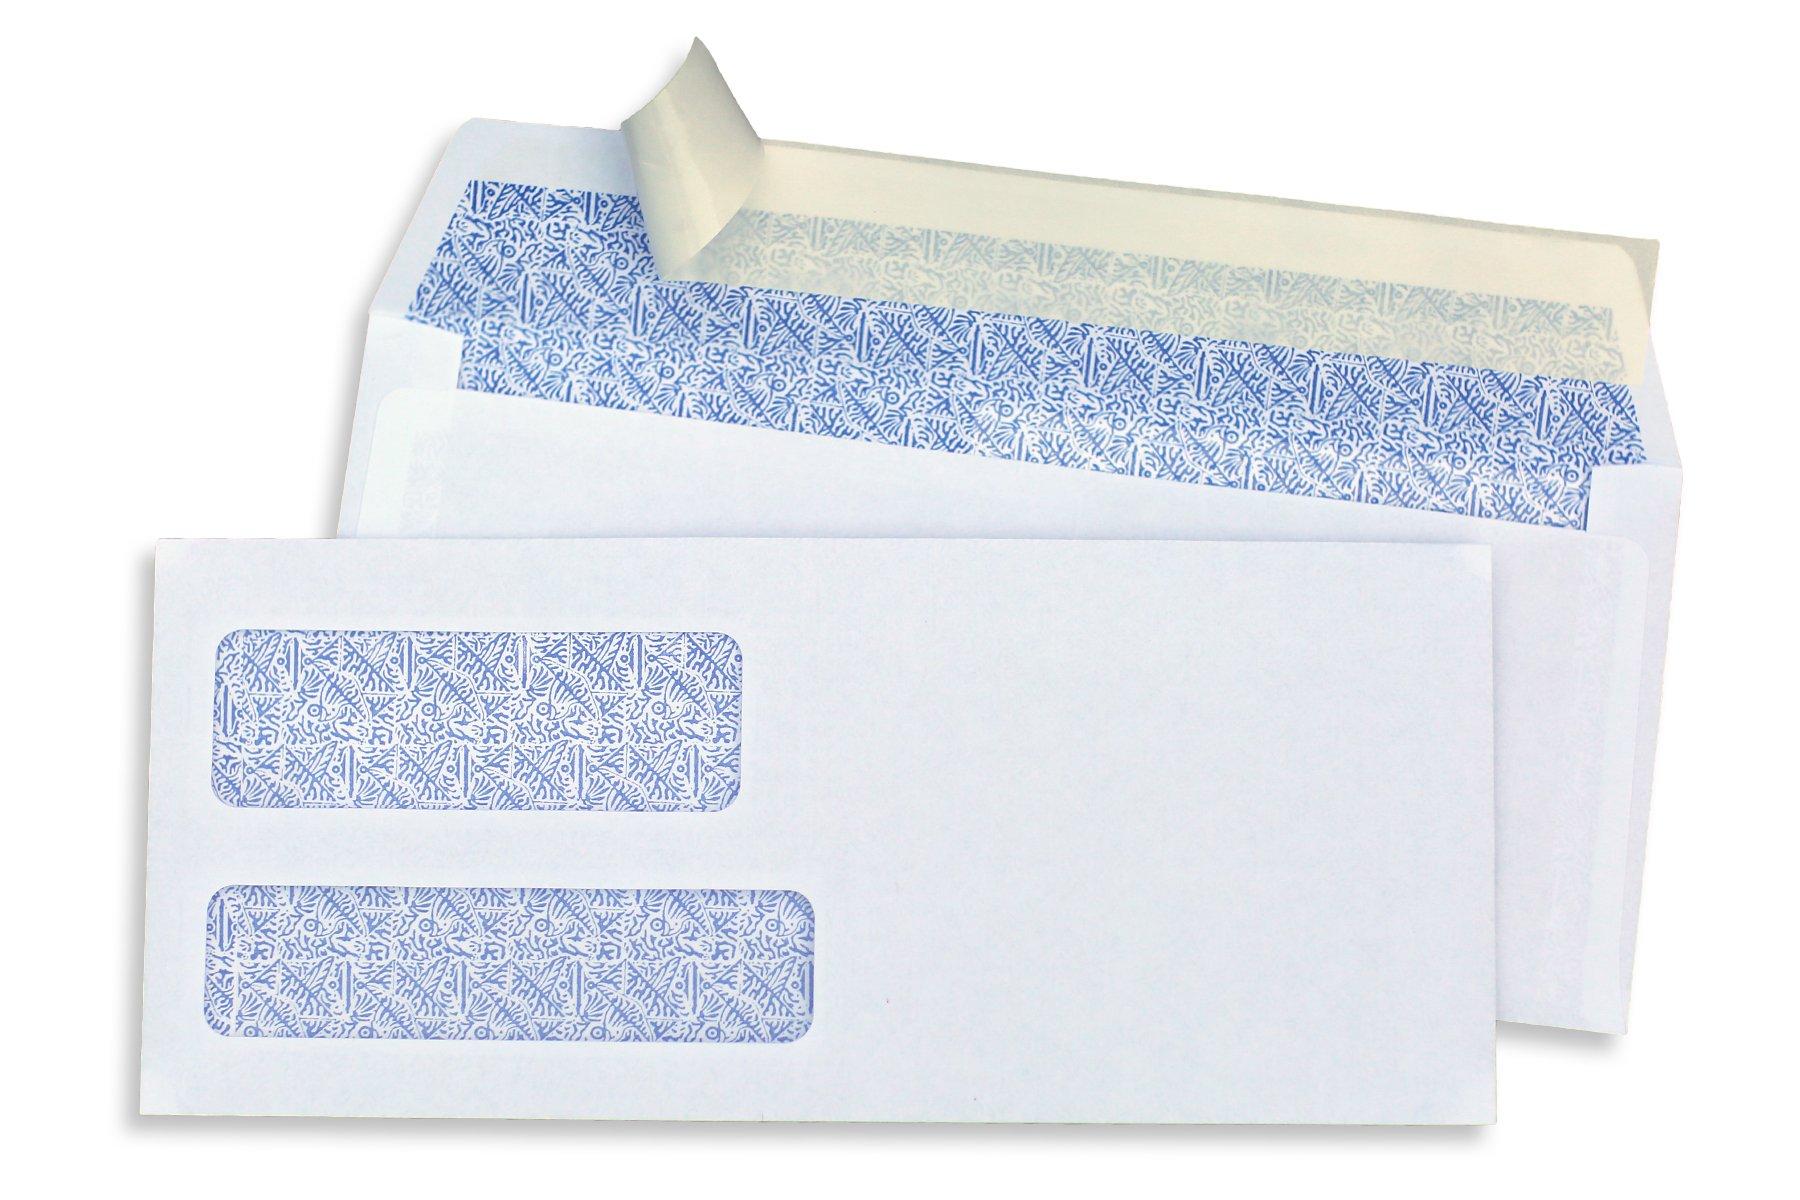 SendIt #9 Double Window Envelopes, PEEL & SEAL, White, Blue Birdseye Security Pattern, 500 ct